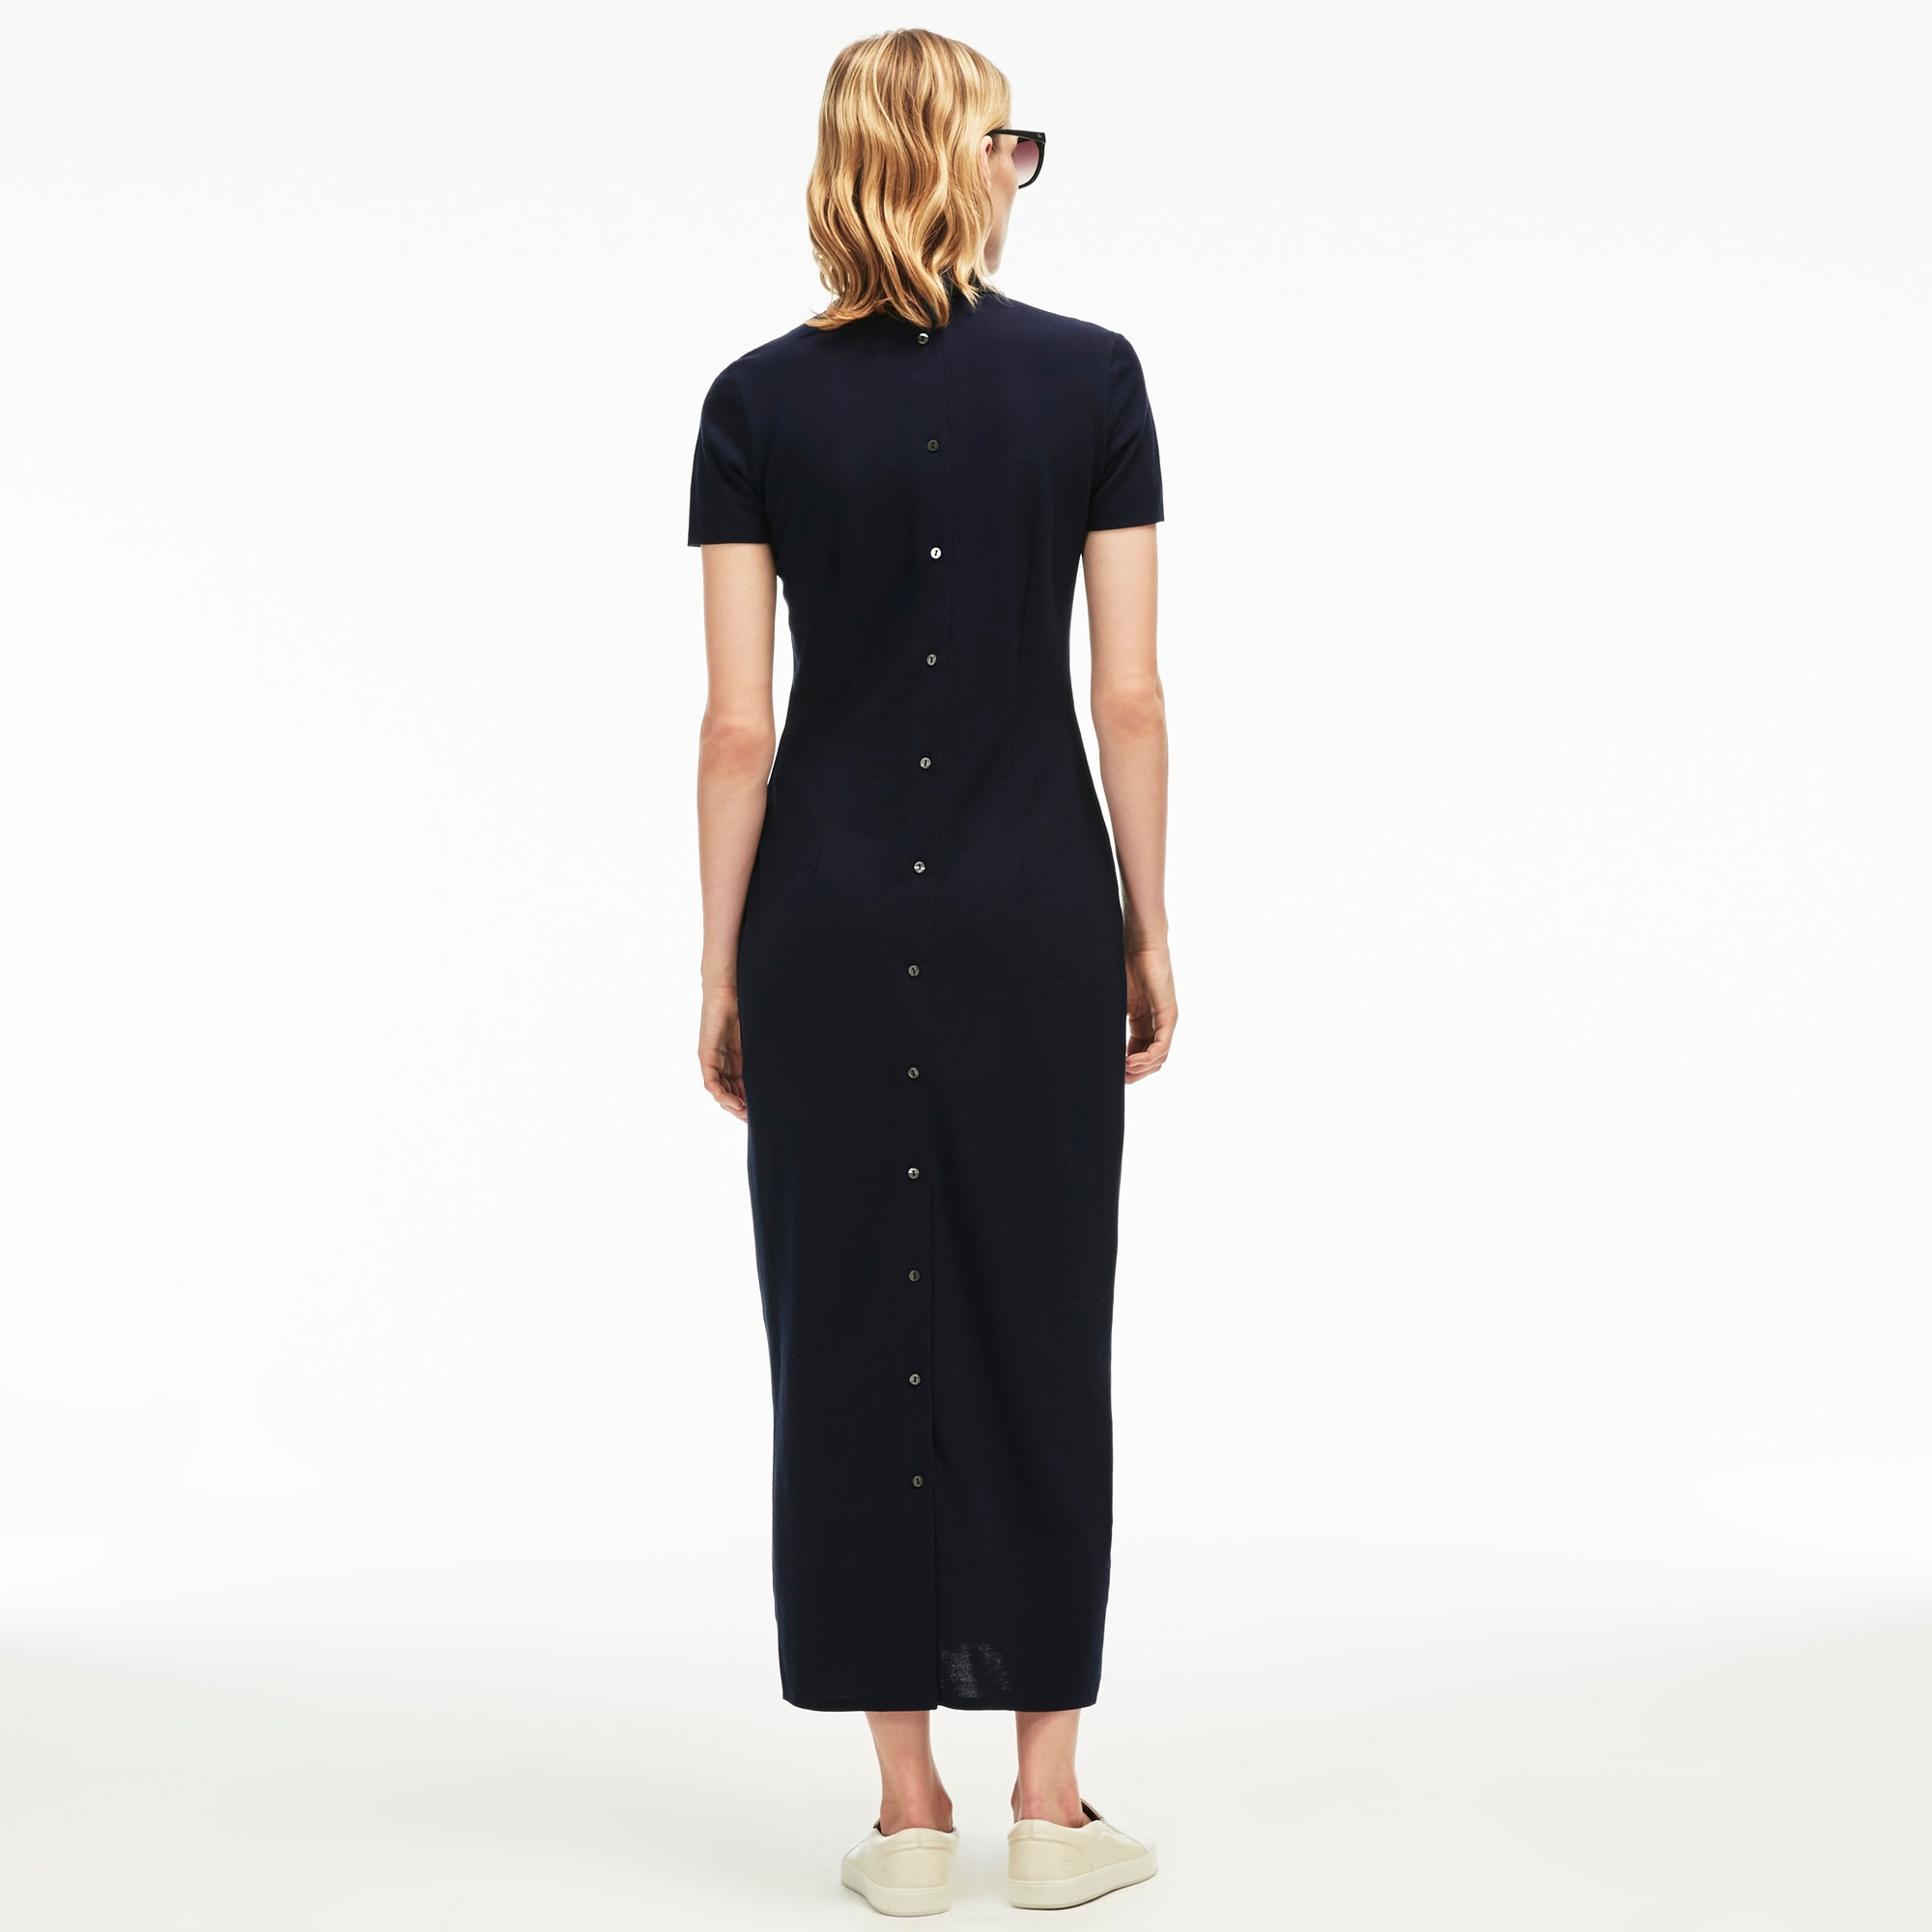 Womenu0026#39;s Buttoned Heavy Piquu00e9 Long Polo Dress | LACOSTE